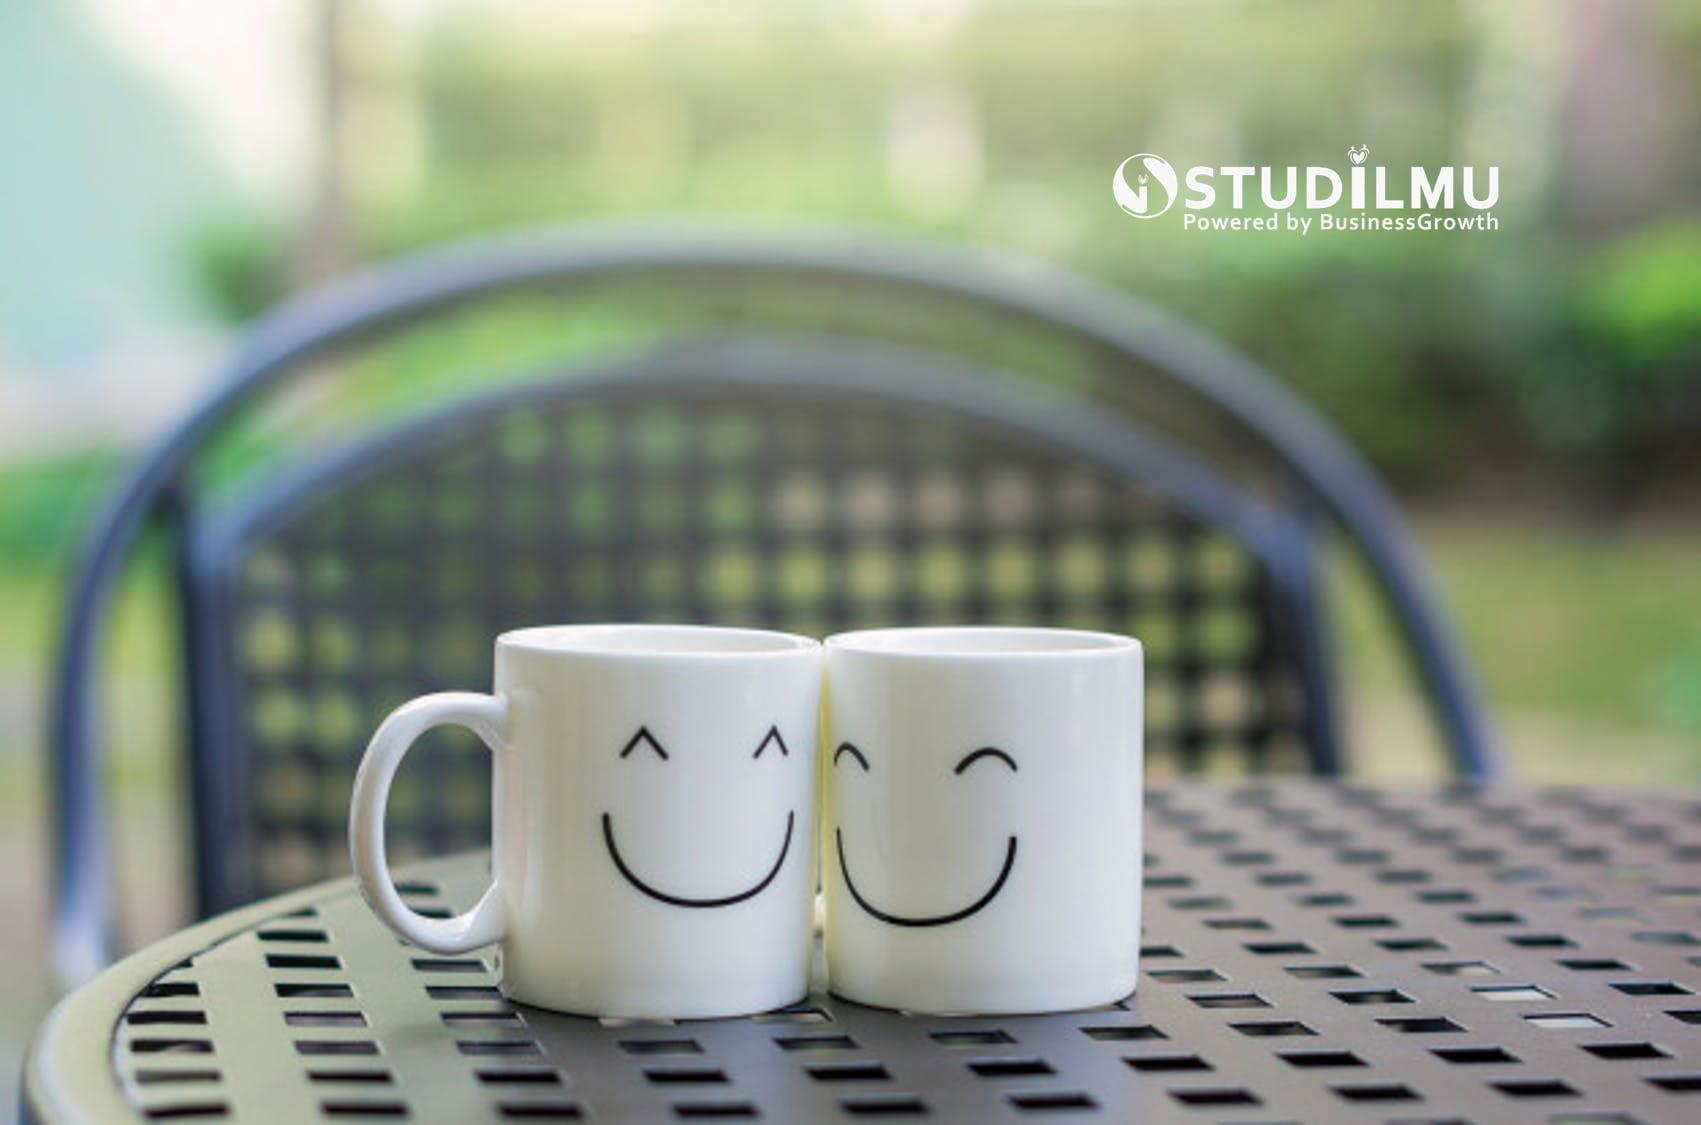 STUDILMU Career Advice - 7 Cara Meningkatkan Kebahagiaan Sejati dan Produktivitas Para Karyawan